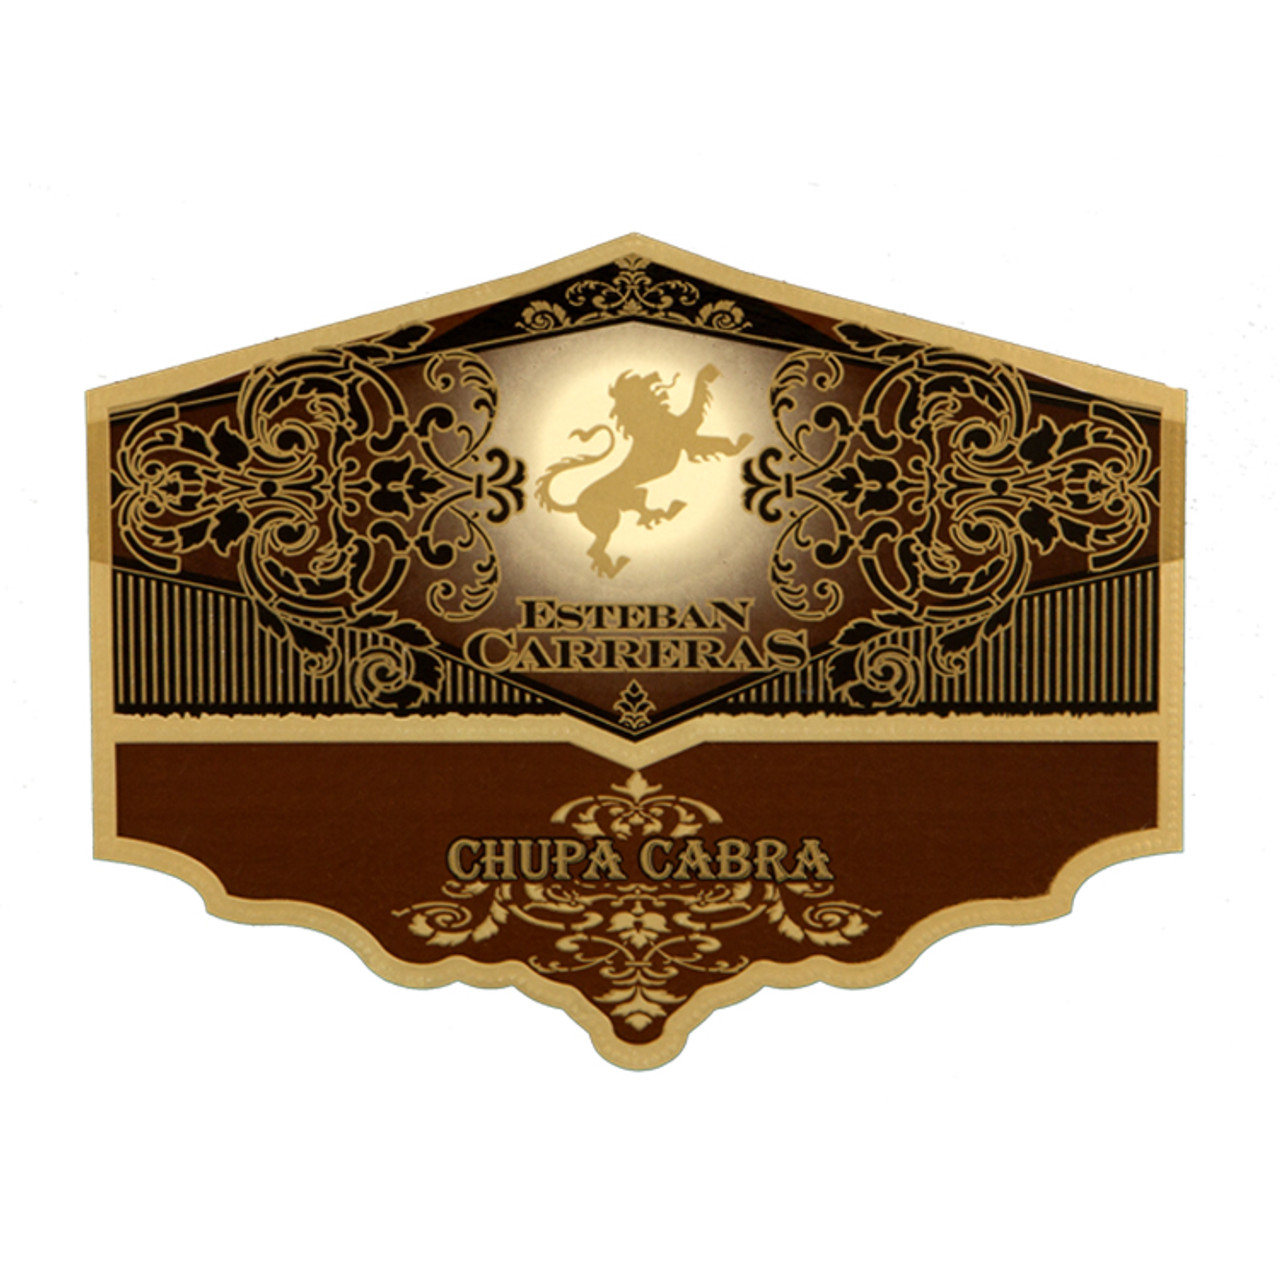 Esteban Carreras Chupacabra Robusto Grande Maduro Cigars - 5.5 x 54 (Box of 20)